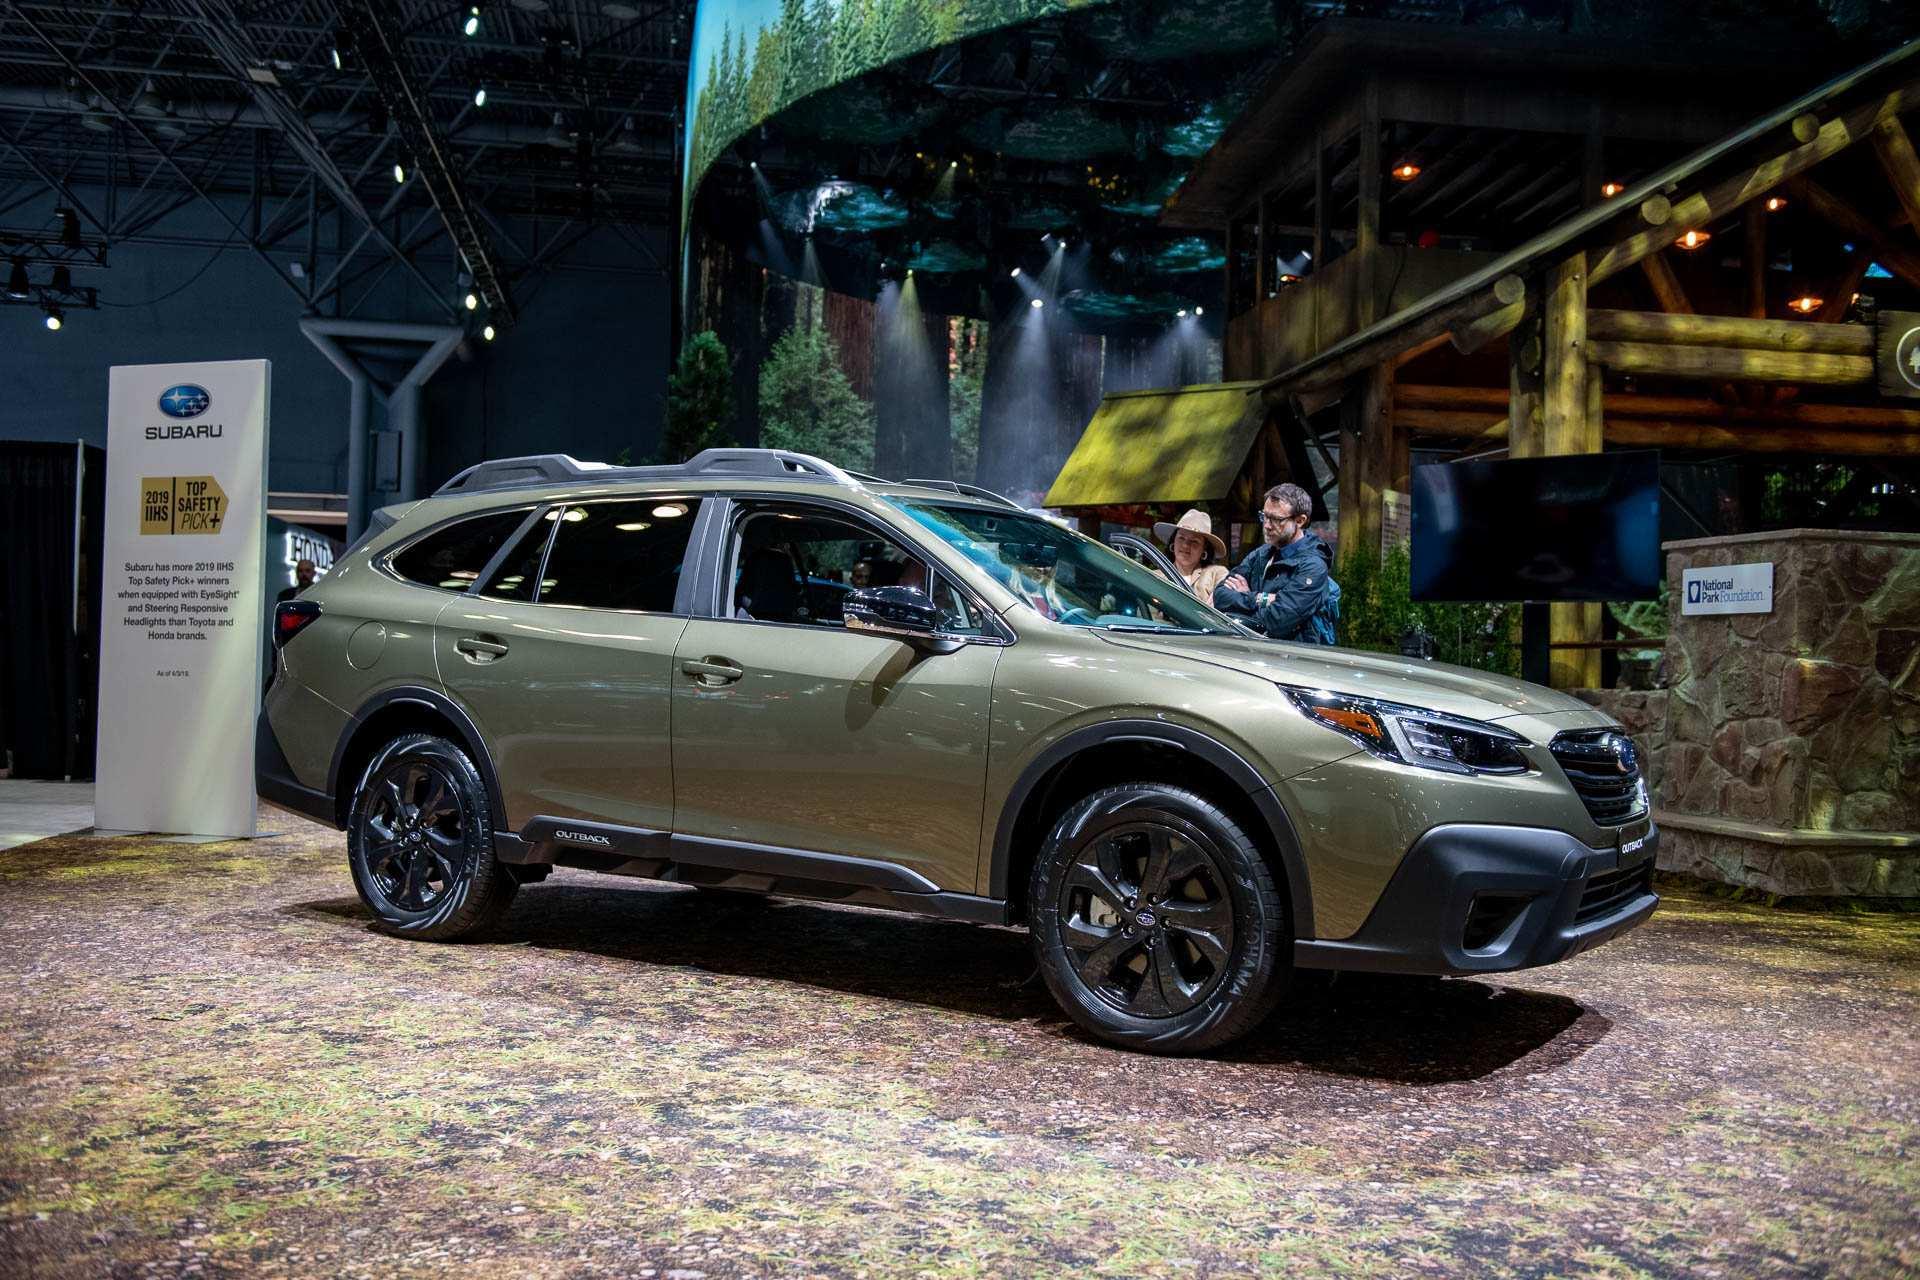 34 Concept of Subaru Suv 2020 Specs and Review for Subaru Suv 2020